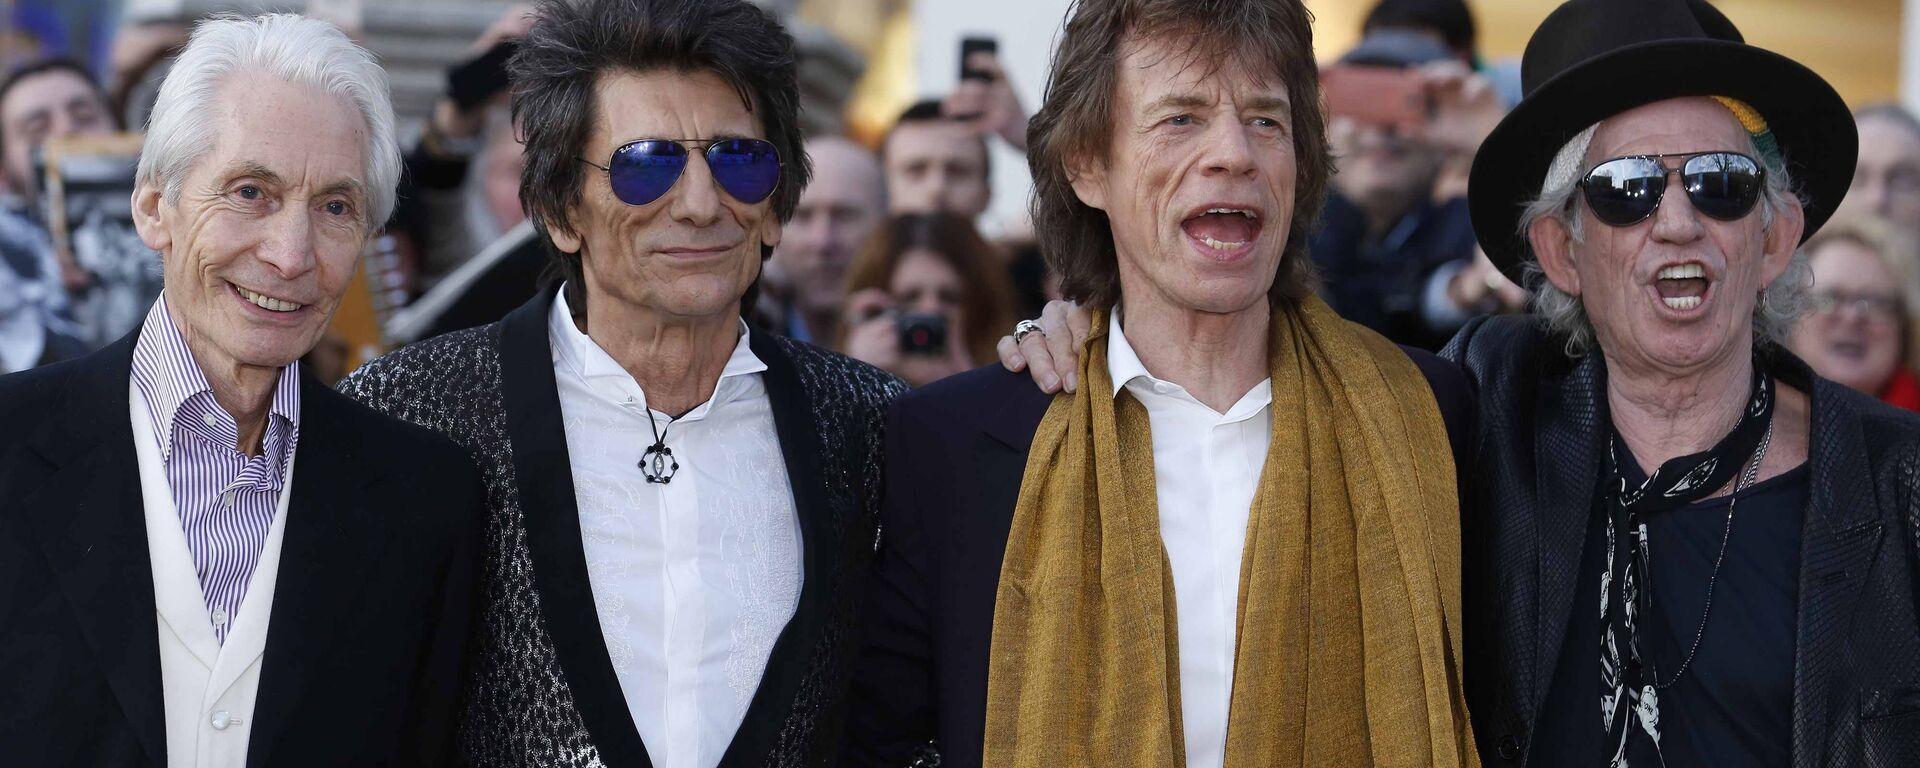 Rolling Stones: Charlie Watts, Ronnie Wood, Mick Jagger i Keith Richards - Sputnik Polska, 1920, 24.08.2021